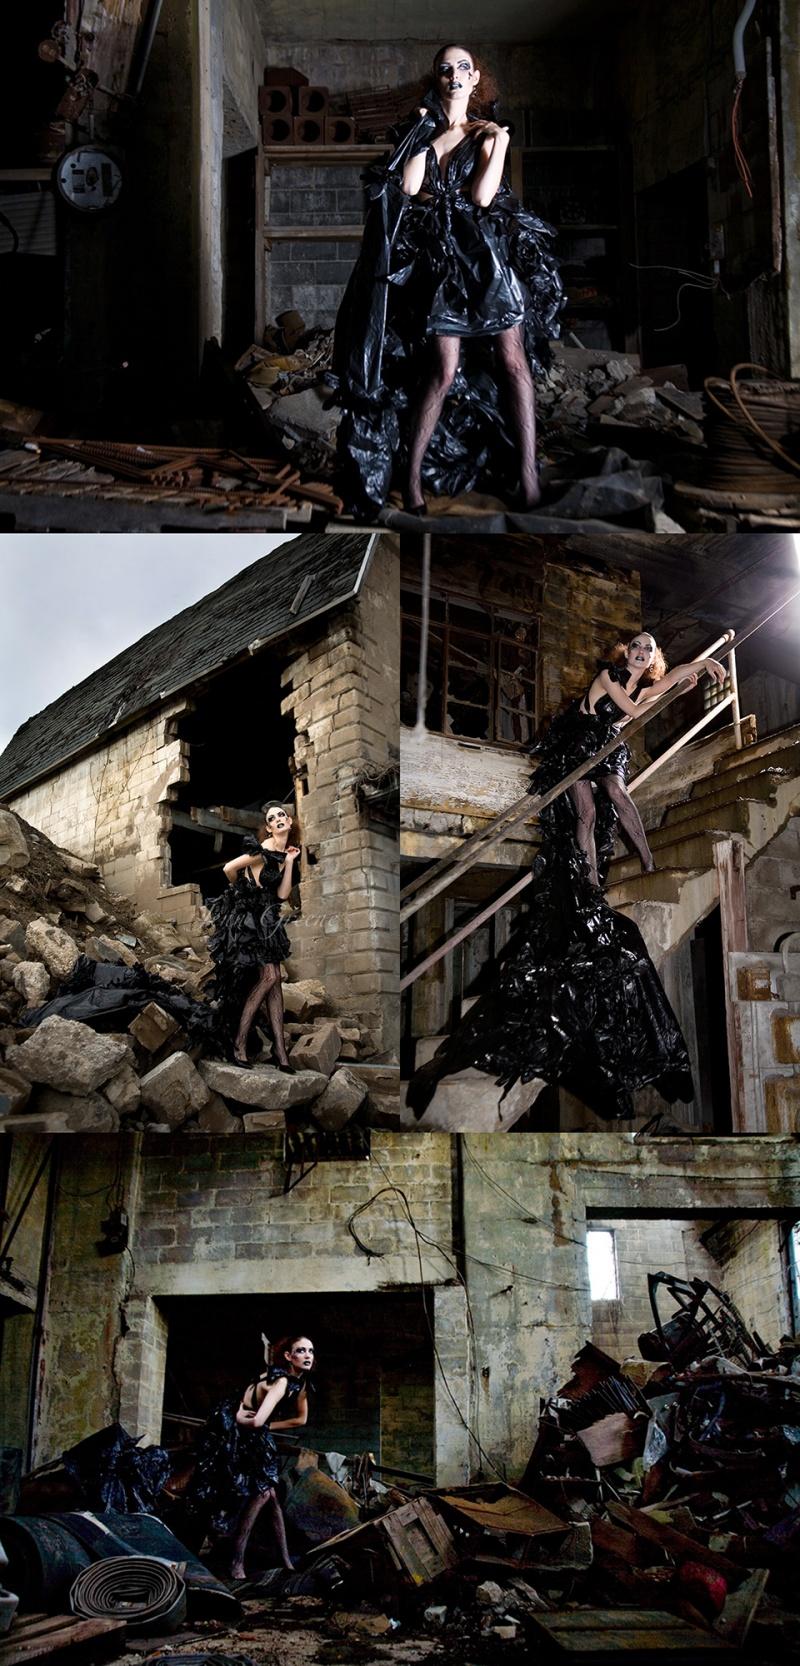 Rochester, NY Oct 29, 2008 Jenn Greene Haute Couture - Black plastic bags